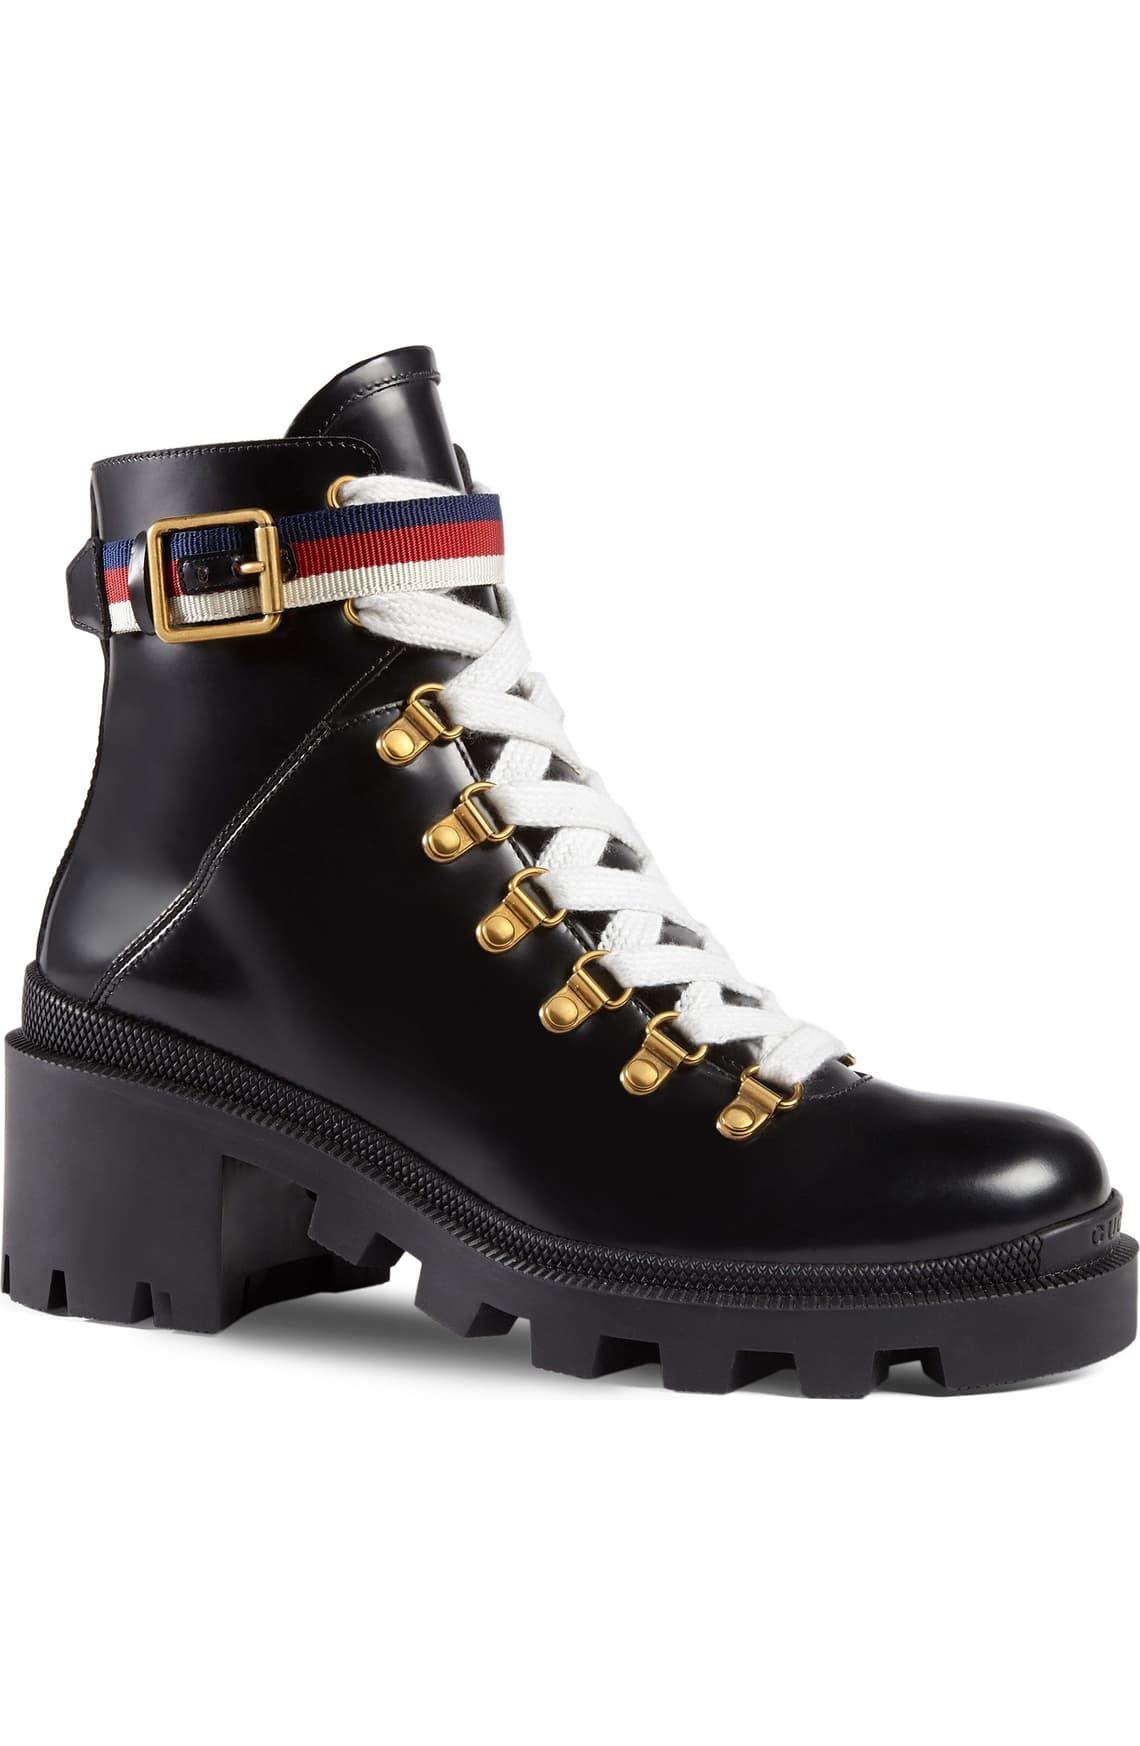 Gucci Trip Lug Sole Combat Boot (Women